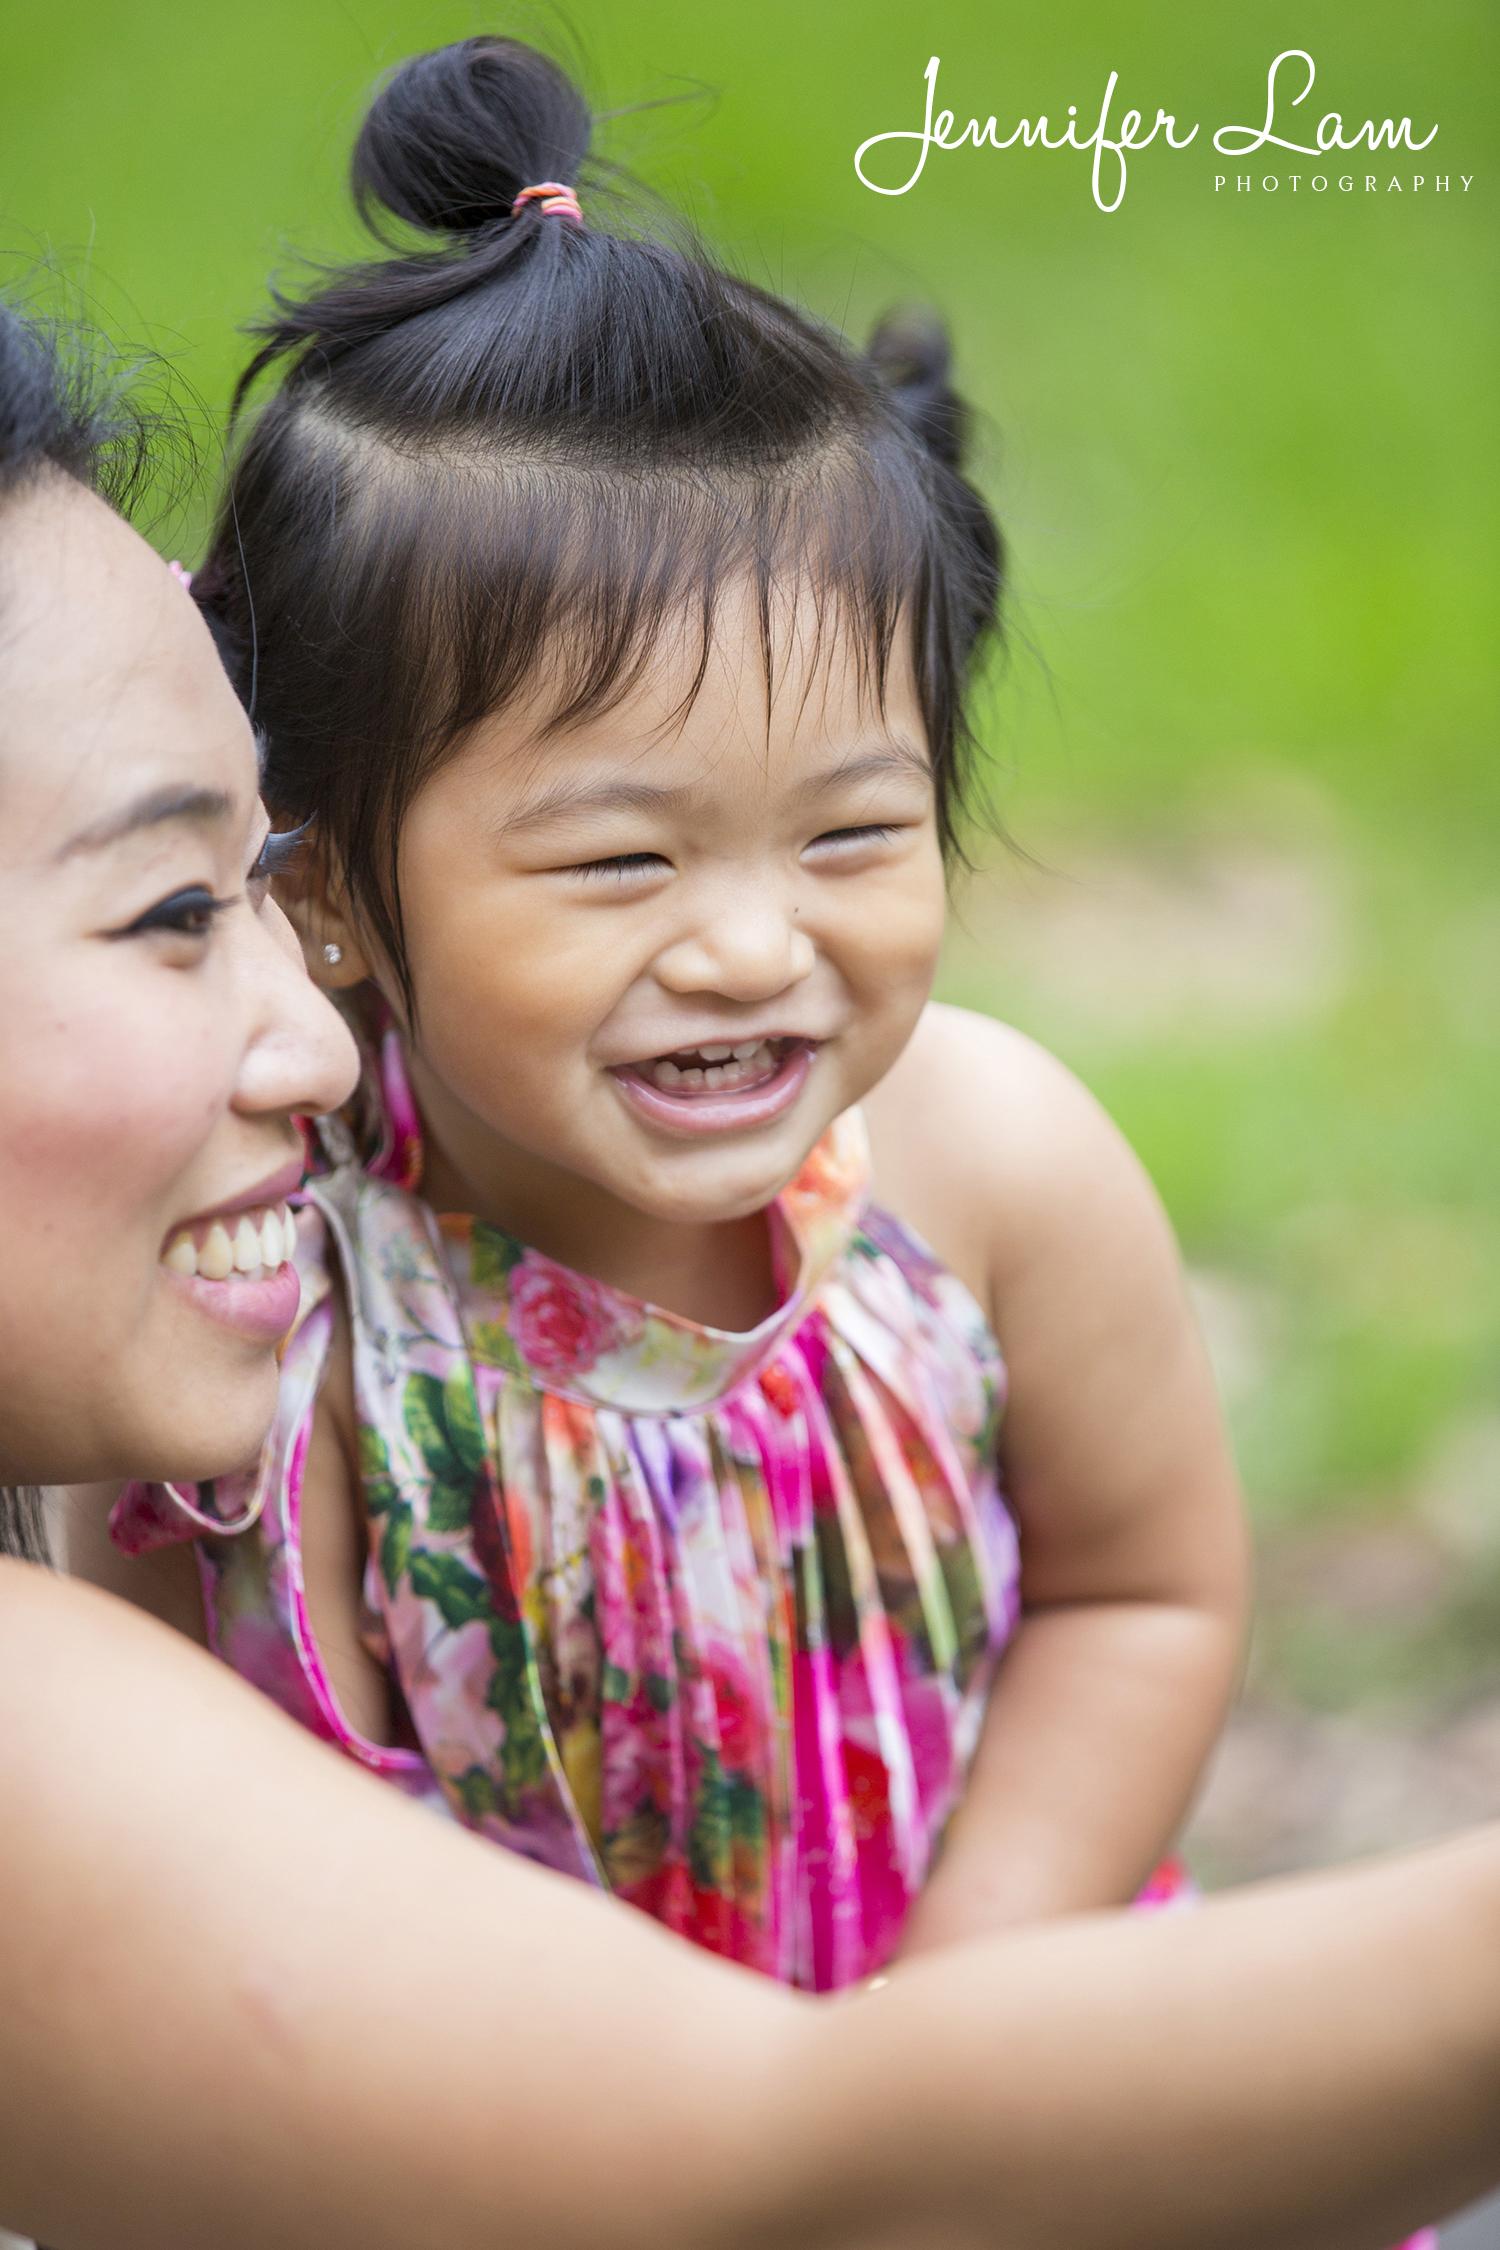 Family Portrait Session - Sydney - Jennifer Lam Photography (20).jpg